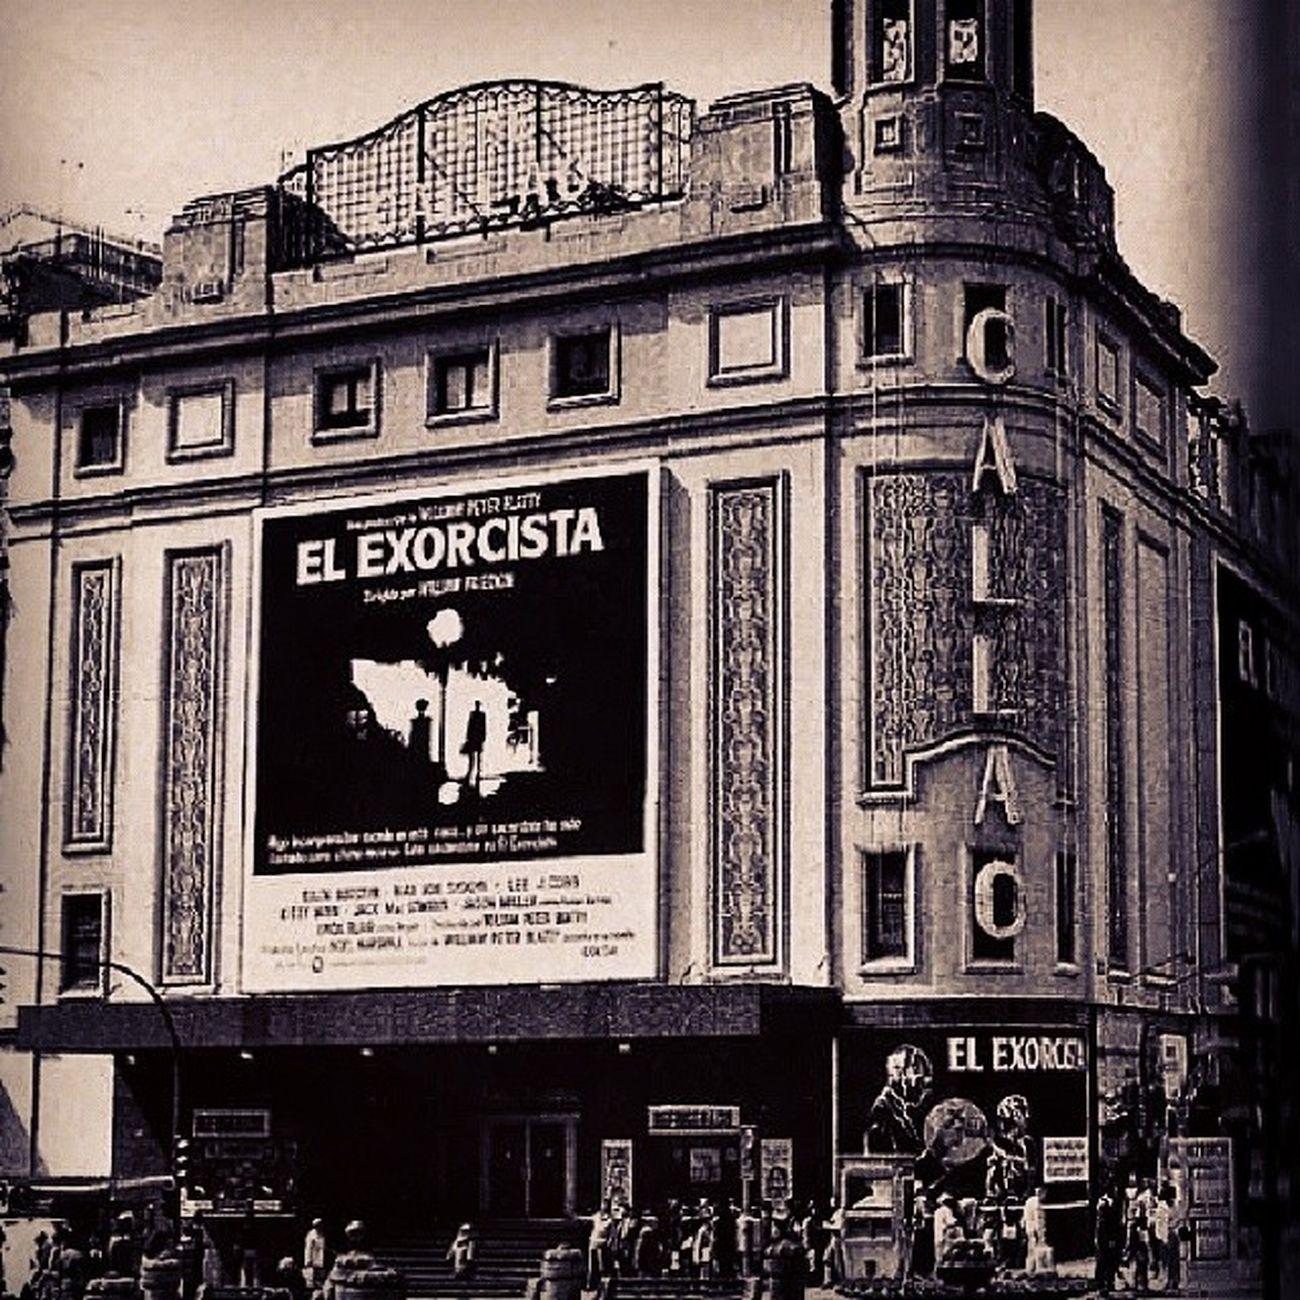 O Exorcista The Exorcist  film premiere